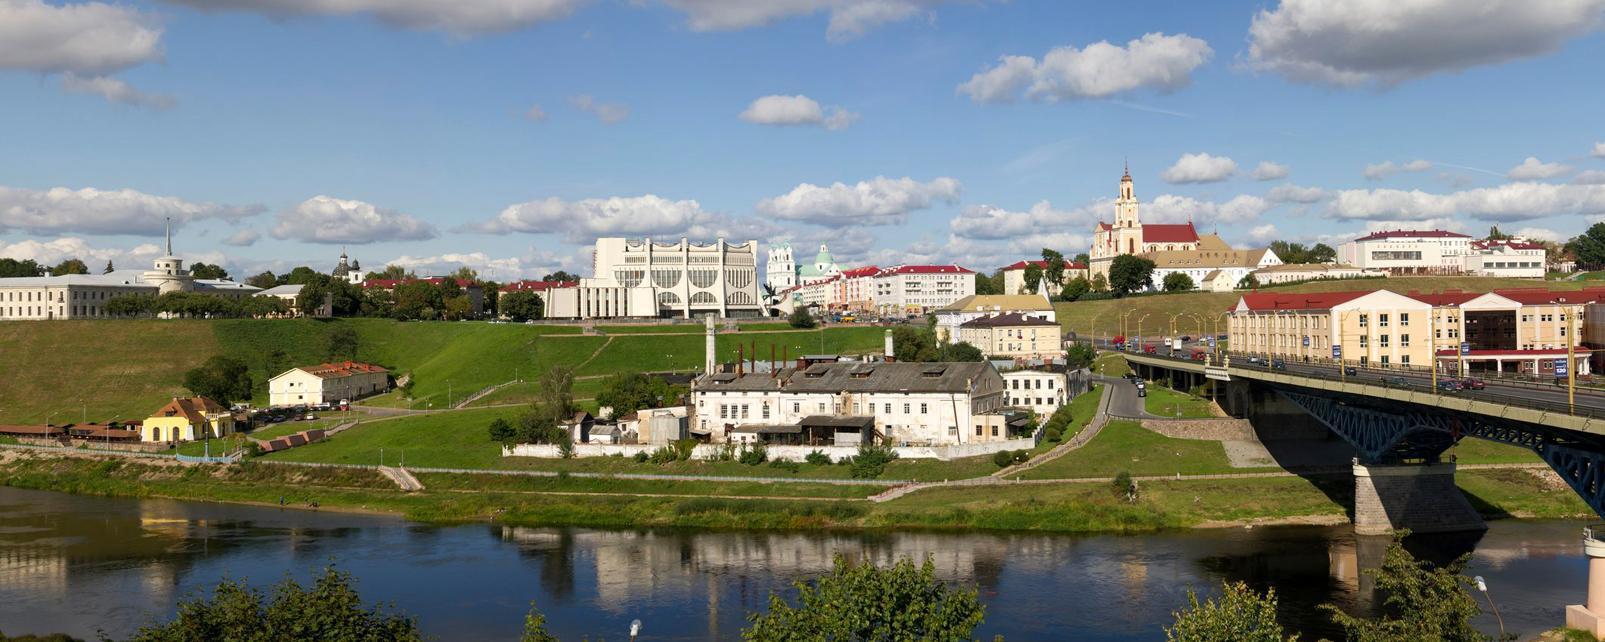 Travel to Grodno, Belarus - Grodno Travel Guide - Easyvoyage